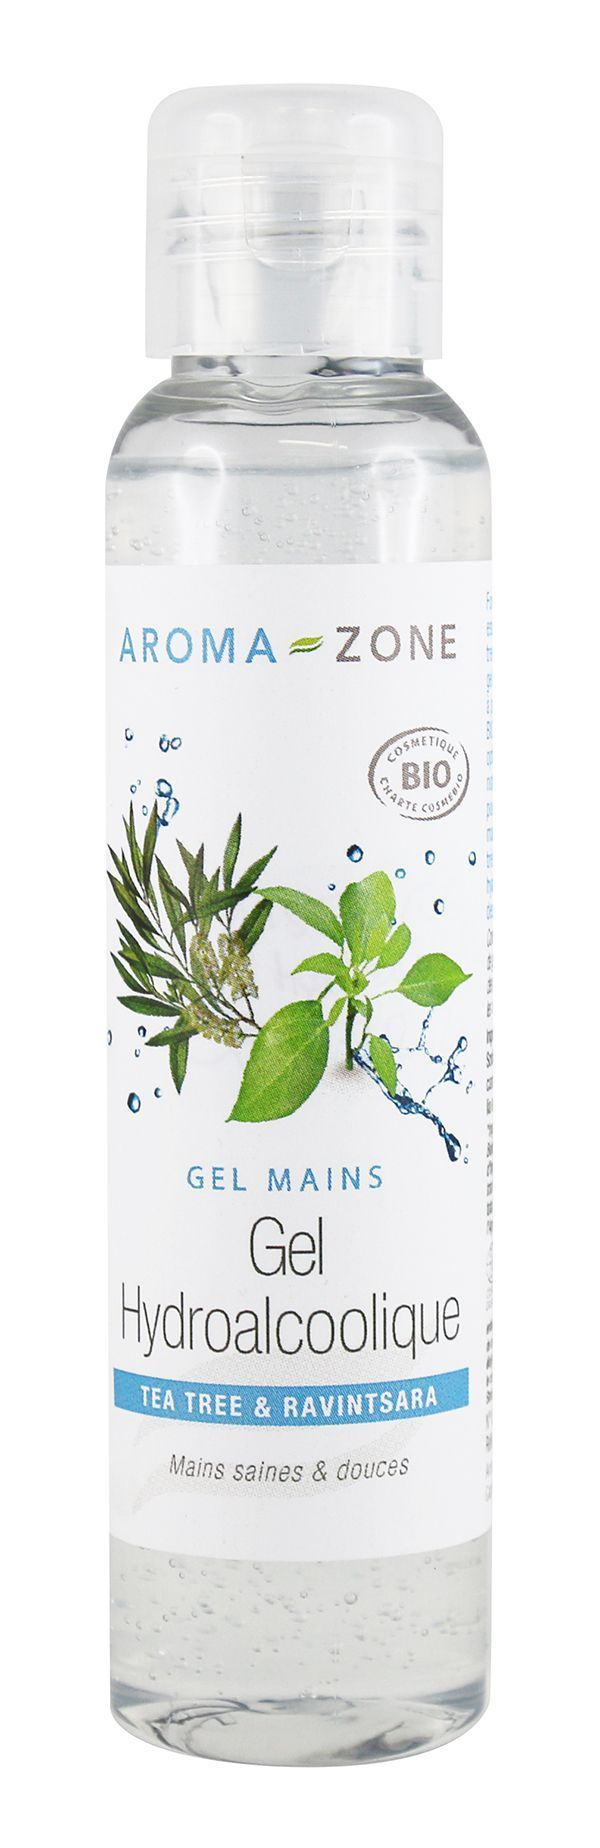 Le gel hydroalcoolique Aroma Zone